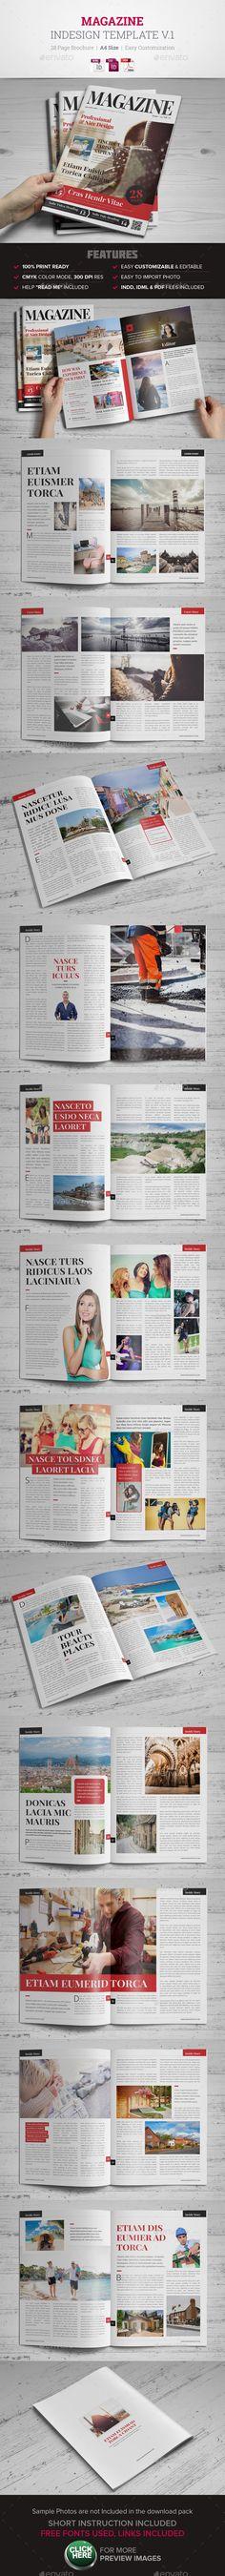 Profesional Business Magazine Indesign Template  Magazine World